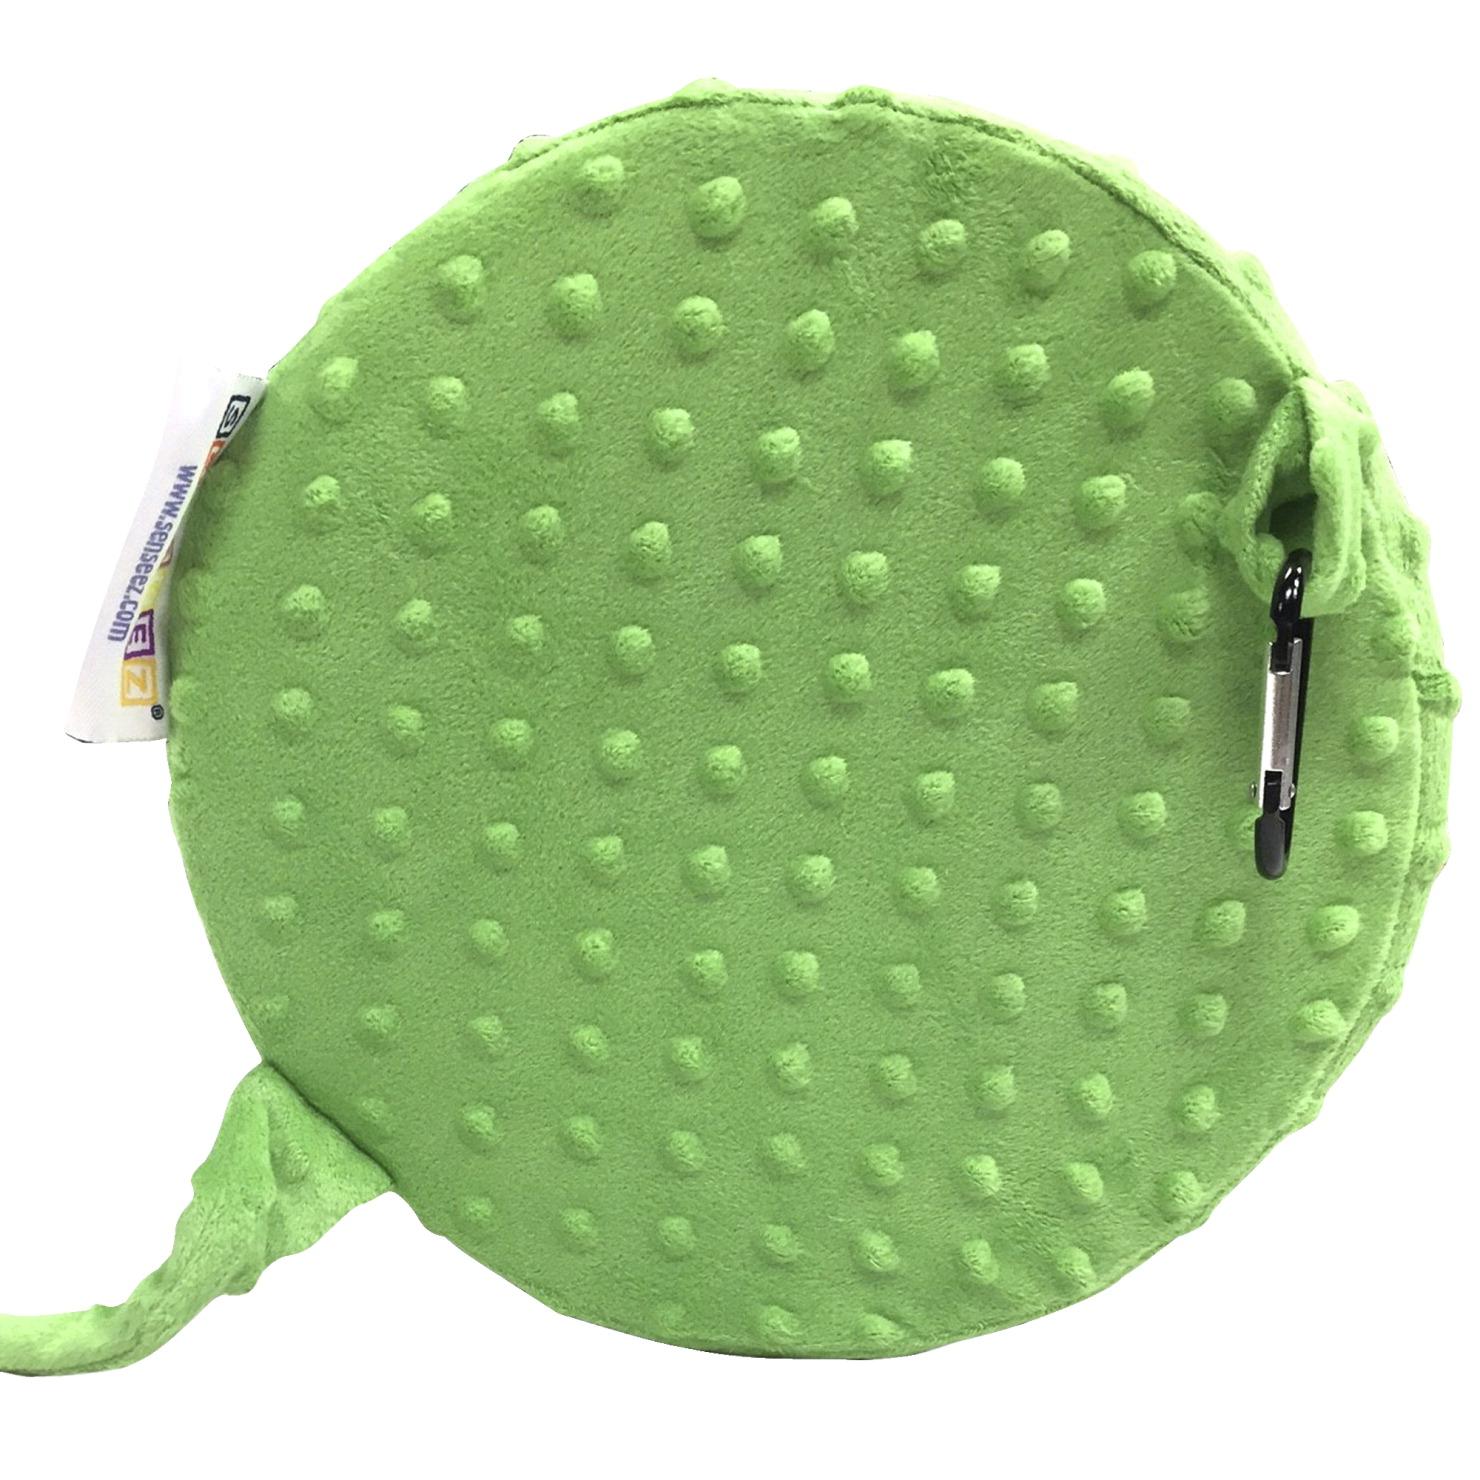 Senseez Vibrating Pillow, Bumpy Turtle - SCHOOL SPECIALTY MARKETPLACE